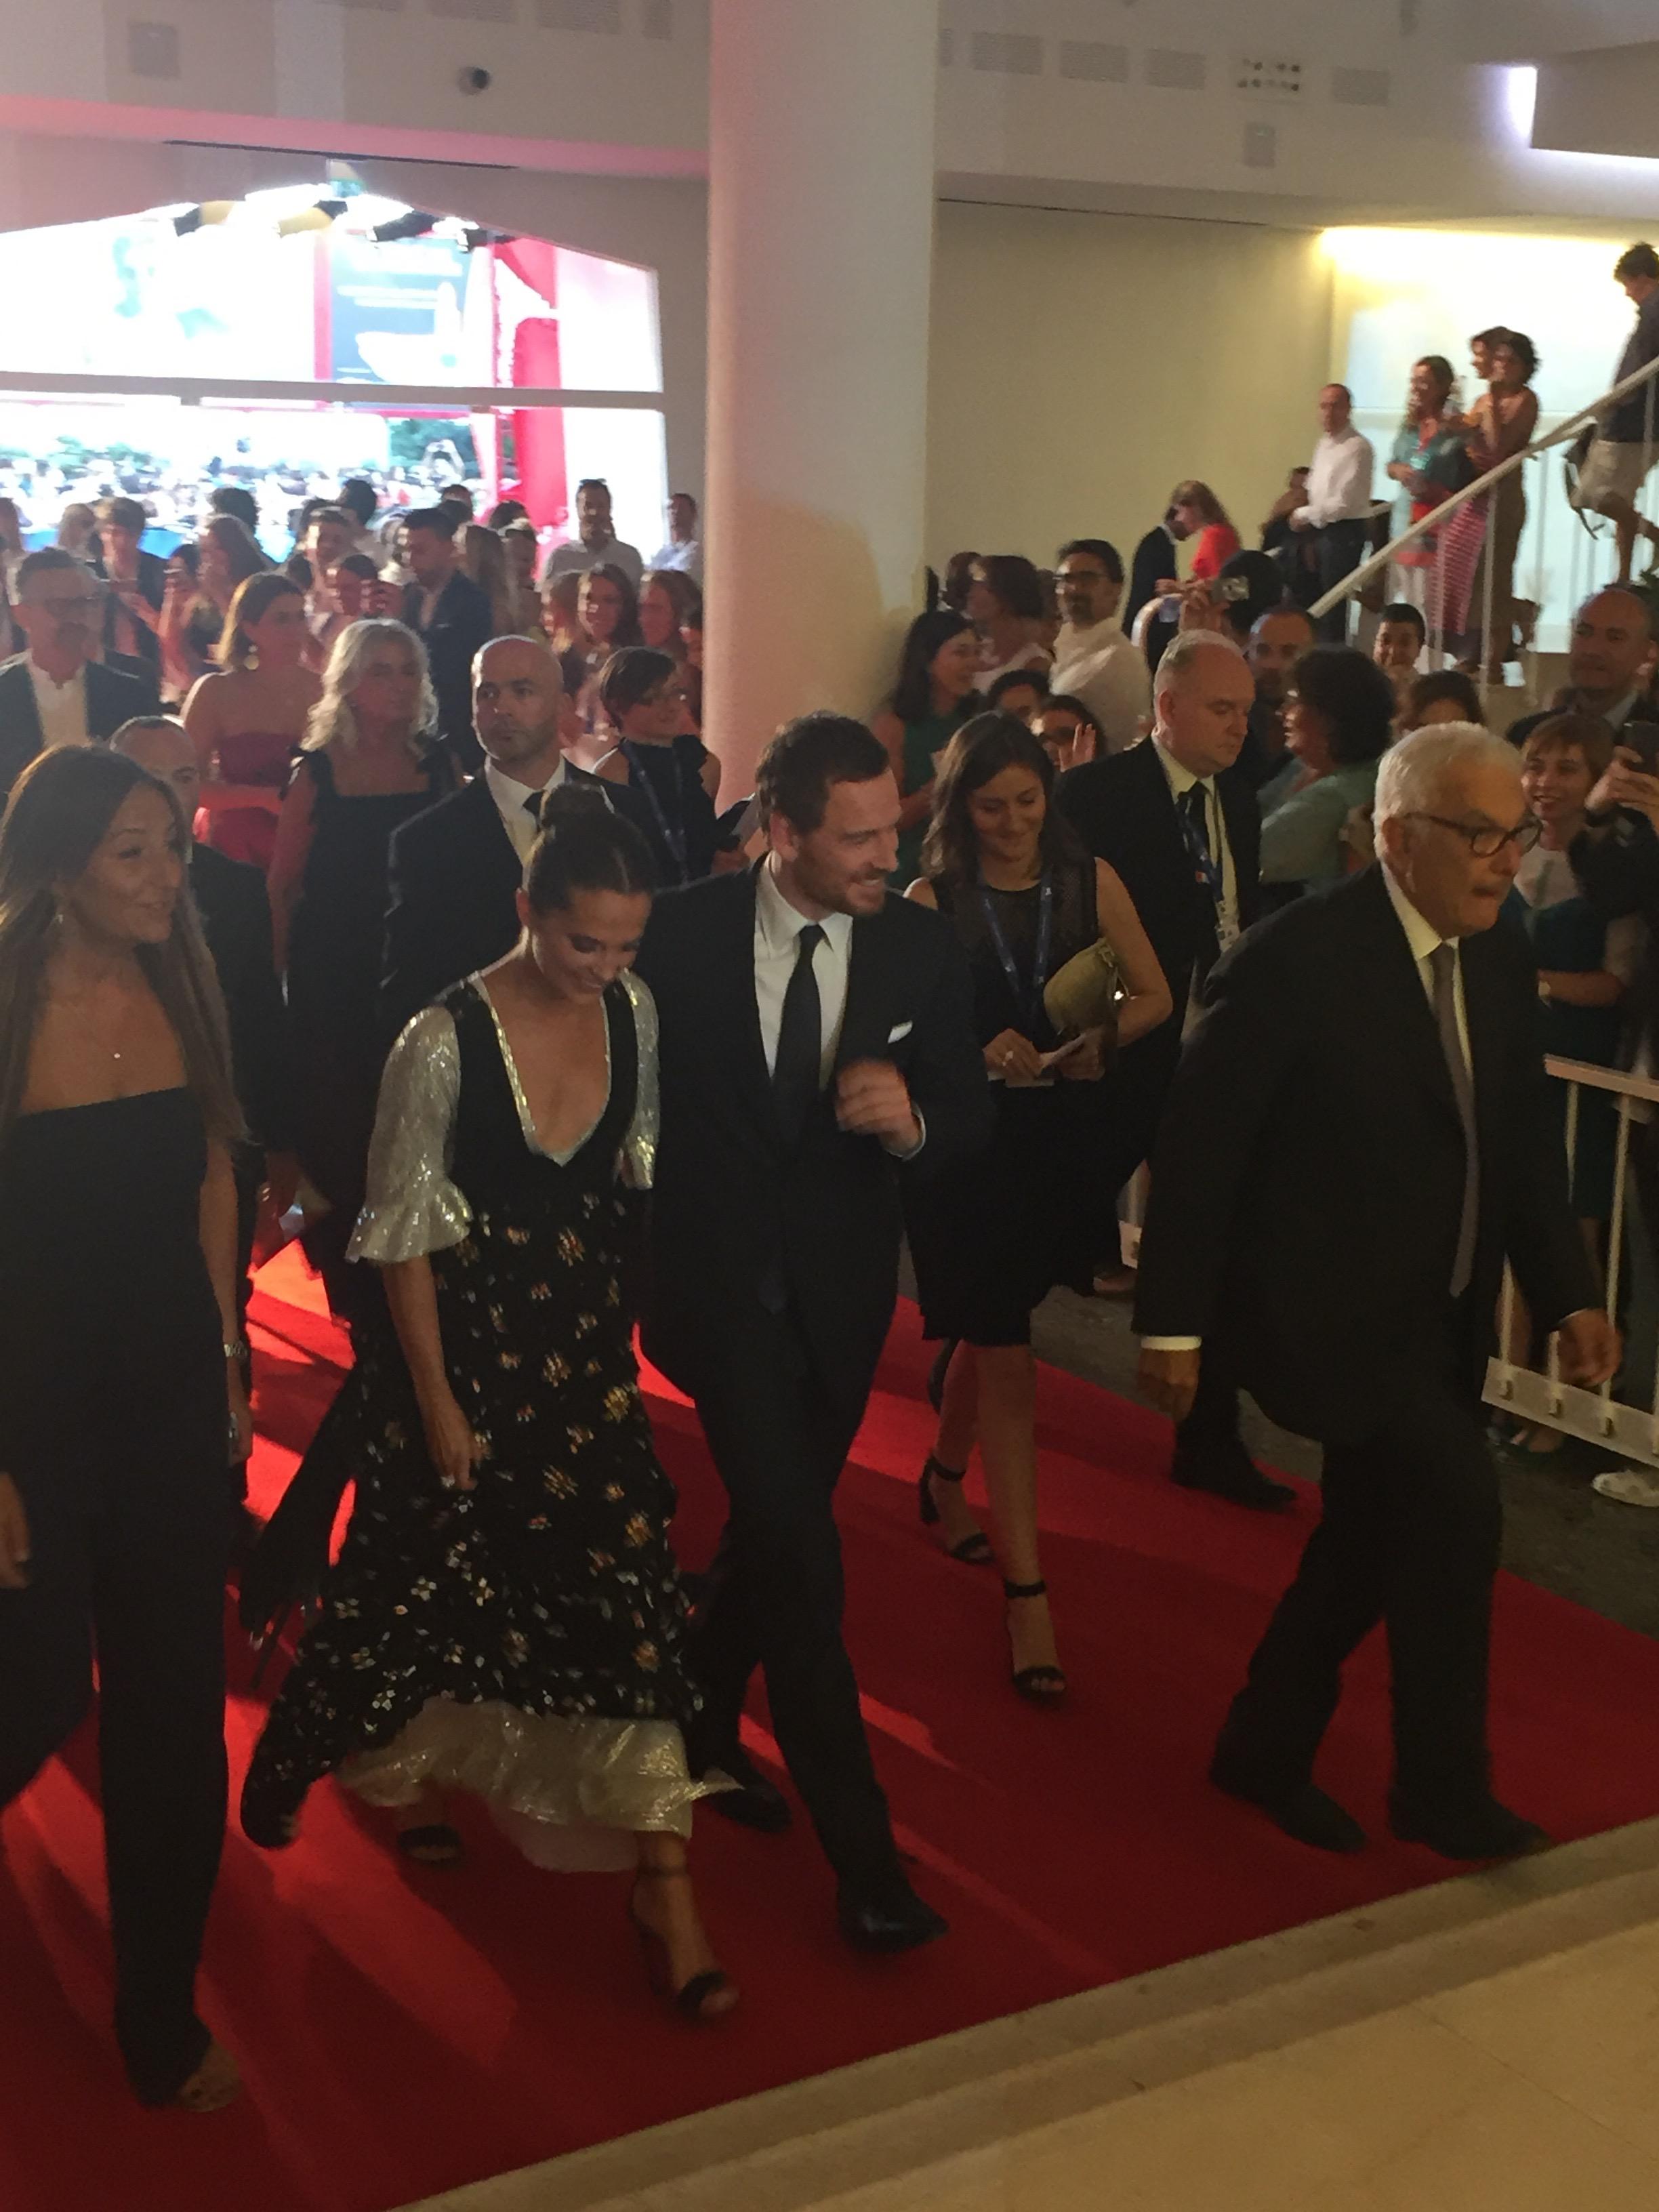 Alicia Vikander and Michael Fassbender arrive to the Venice Film Festival.